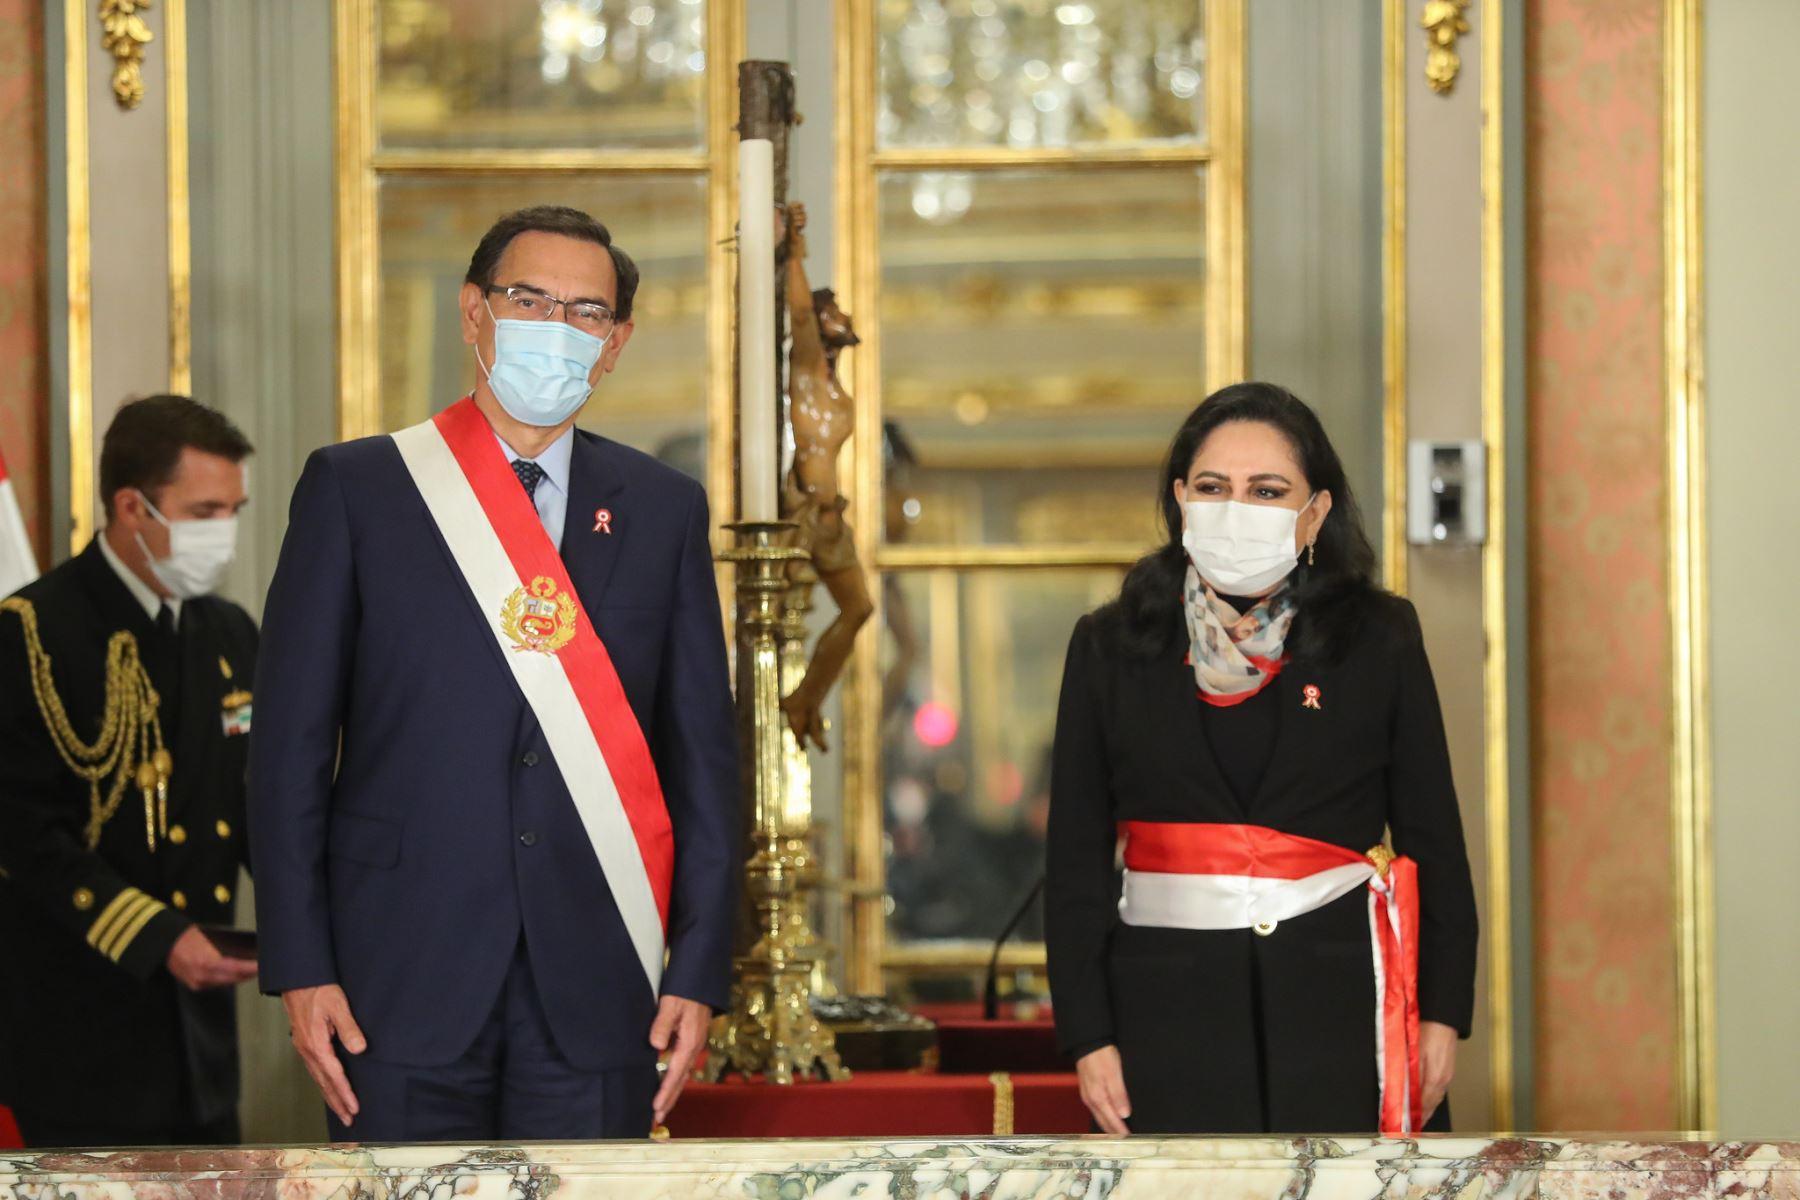 Presidente Martín Vizcarra tomó juramento a Gloria Montenegro como ministra de la Mujer. Foto: ANDINA/Presidencia